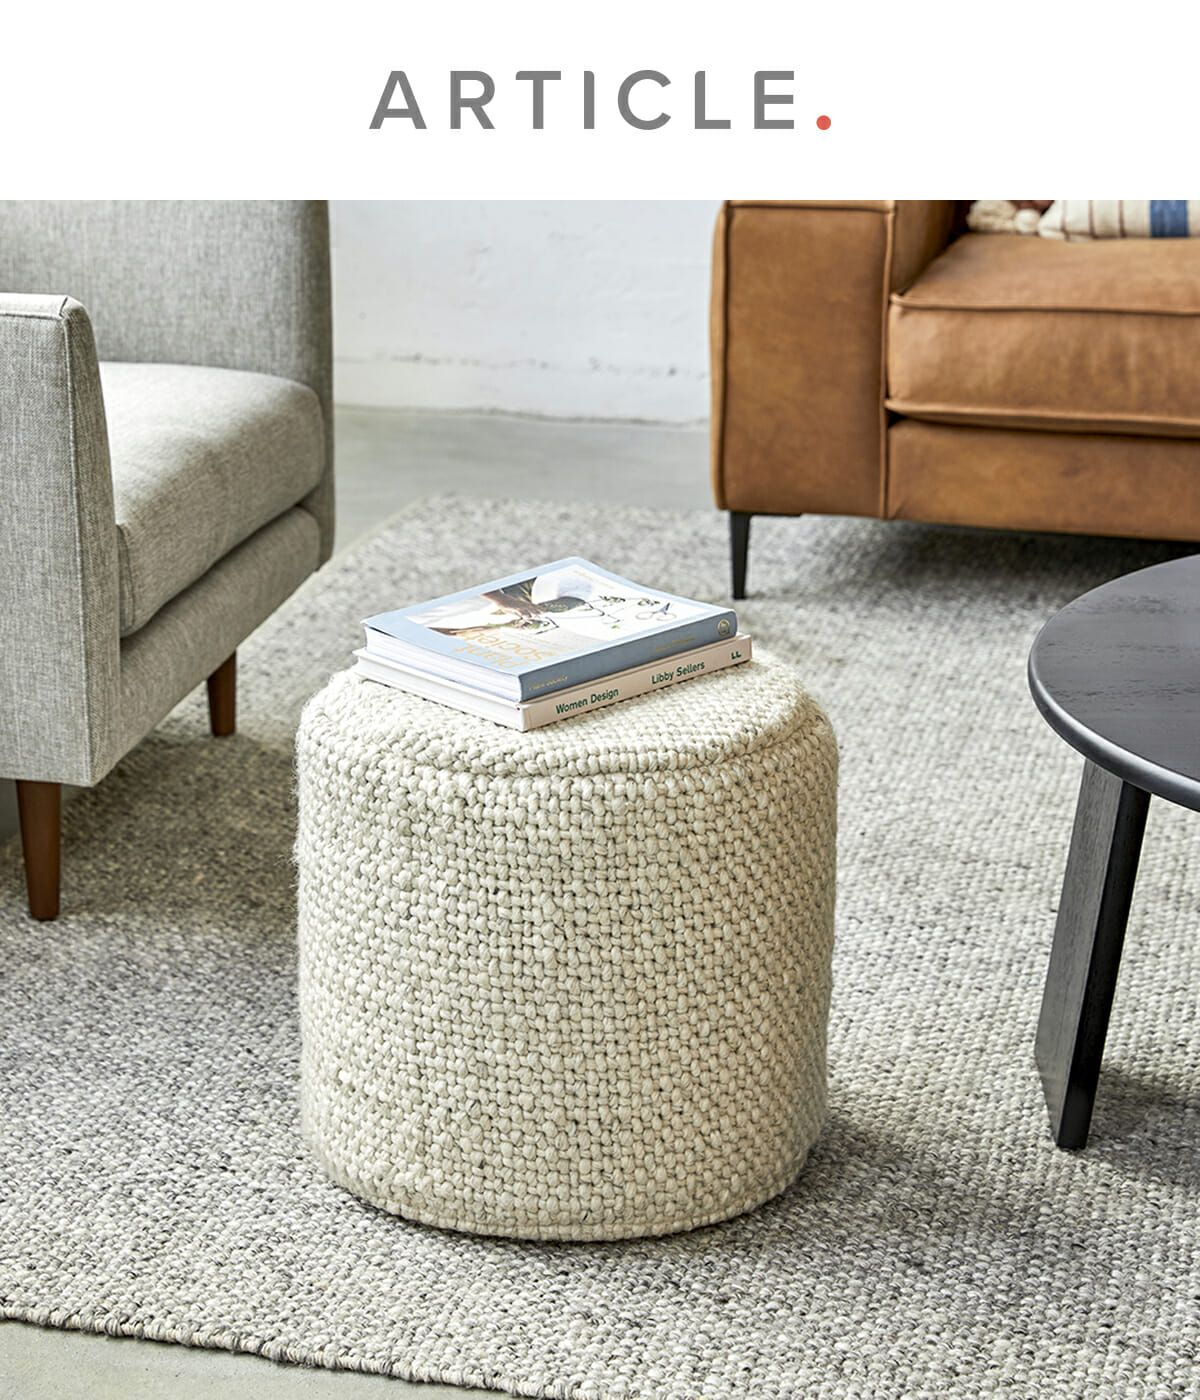 Texa Vanilla Ivory Pouf In 2021 Pouf Ottoman Living Room Ottoman In Living Room Living Room Entertainment [ jpg ]